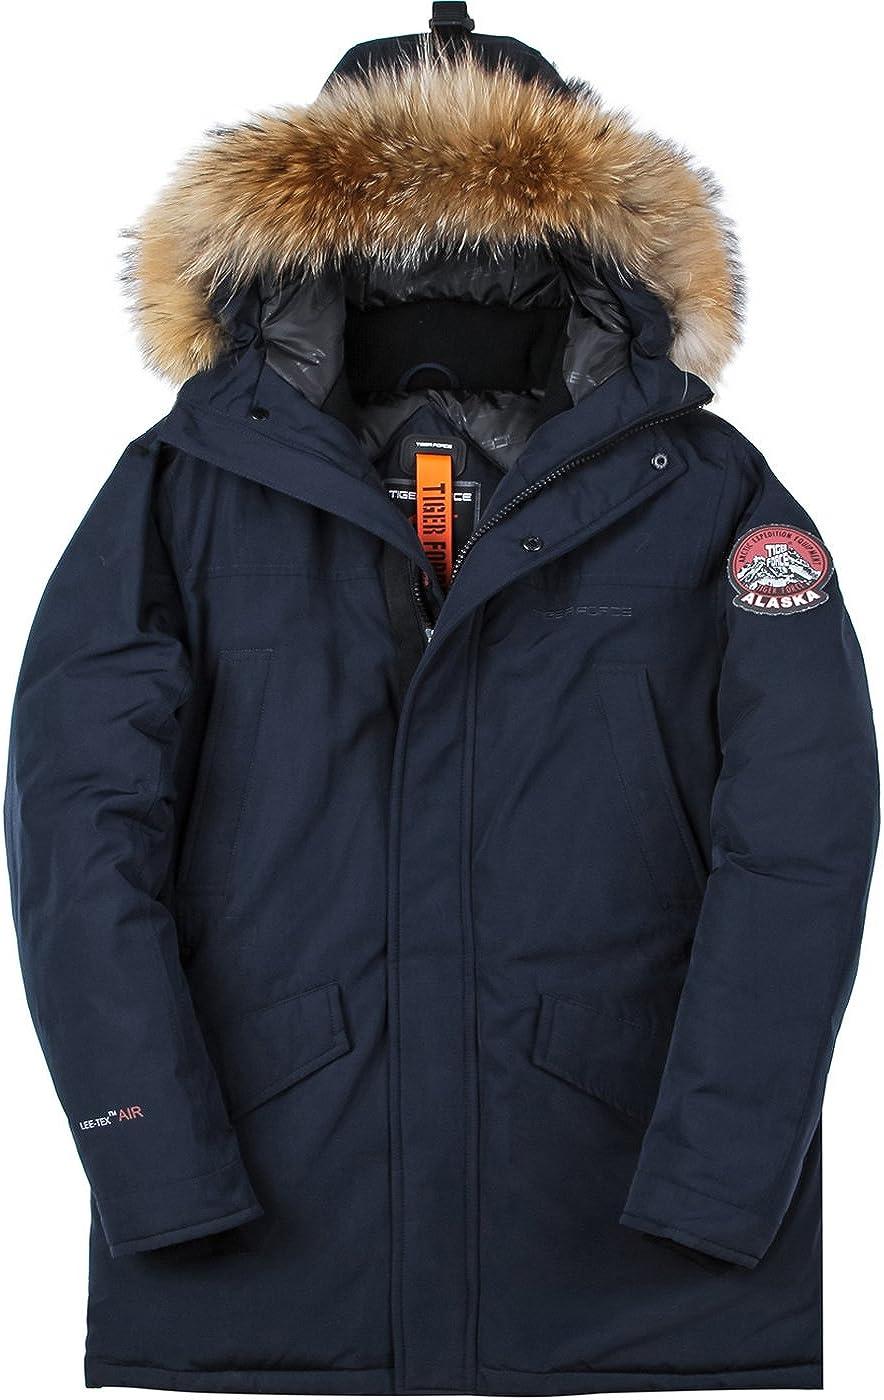 Buy Parka Jacket